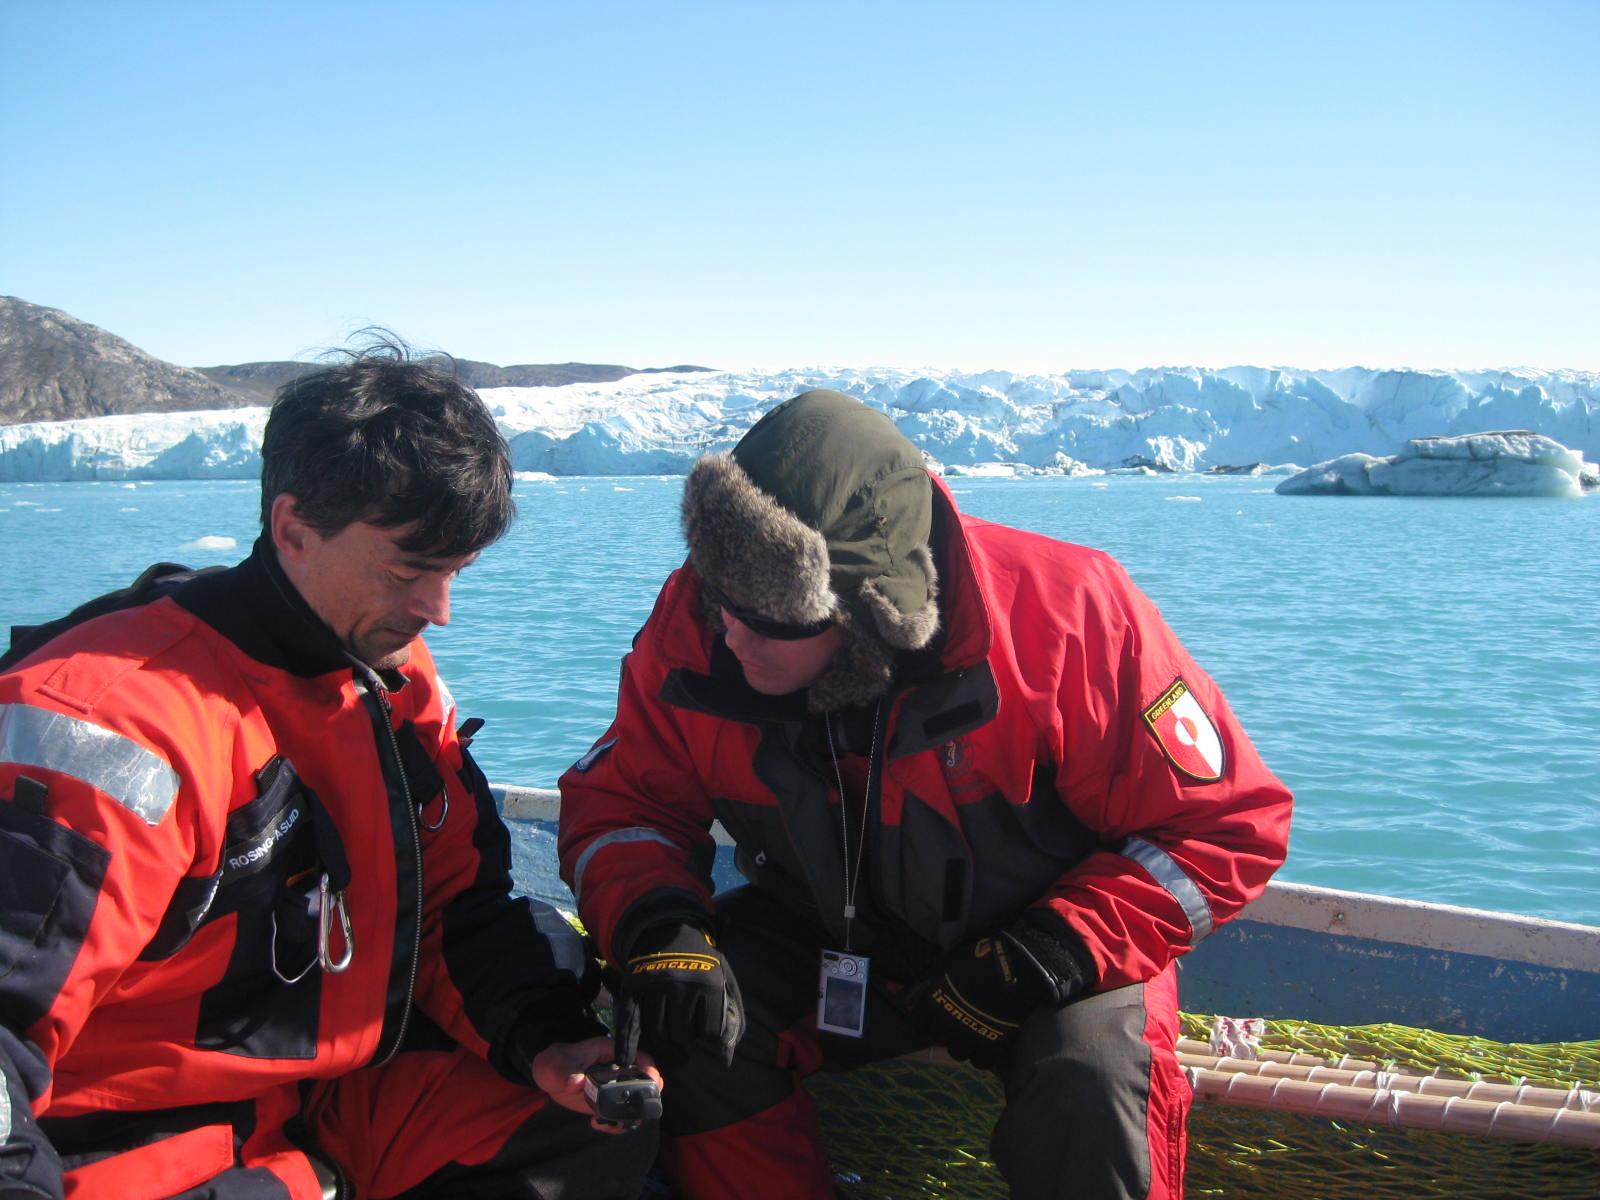 Dr. Aqqalu Rosing-Asvid, Greenland Institute of Natural Resources (left) and Professor David M. Holland, NYU (right), examine data. Photo: Denise Holland